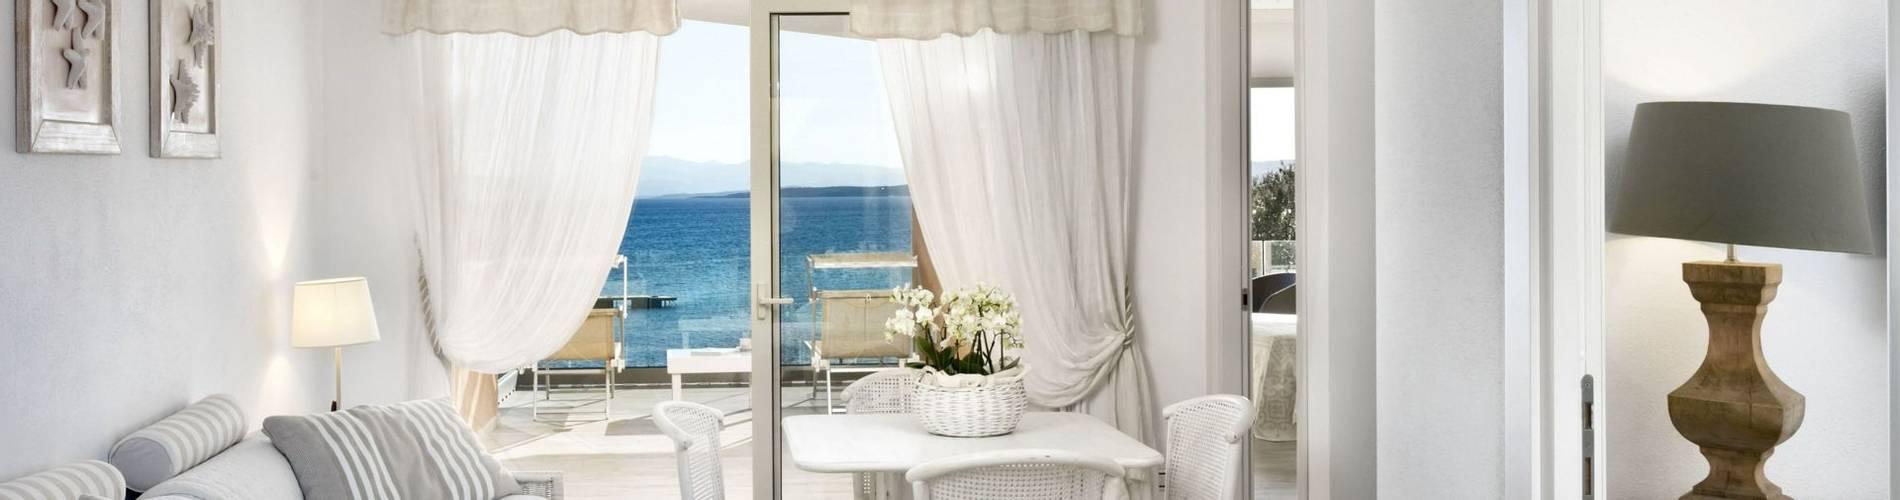 Luxury Suite - Gabbiano Azzurro Hotel _ Suites Sardegna - stampa.jpg